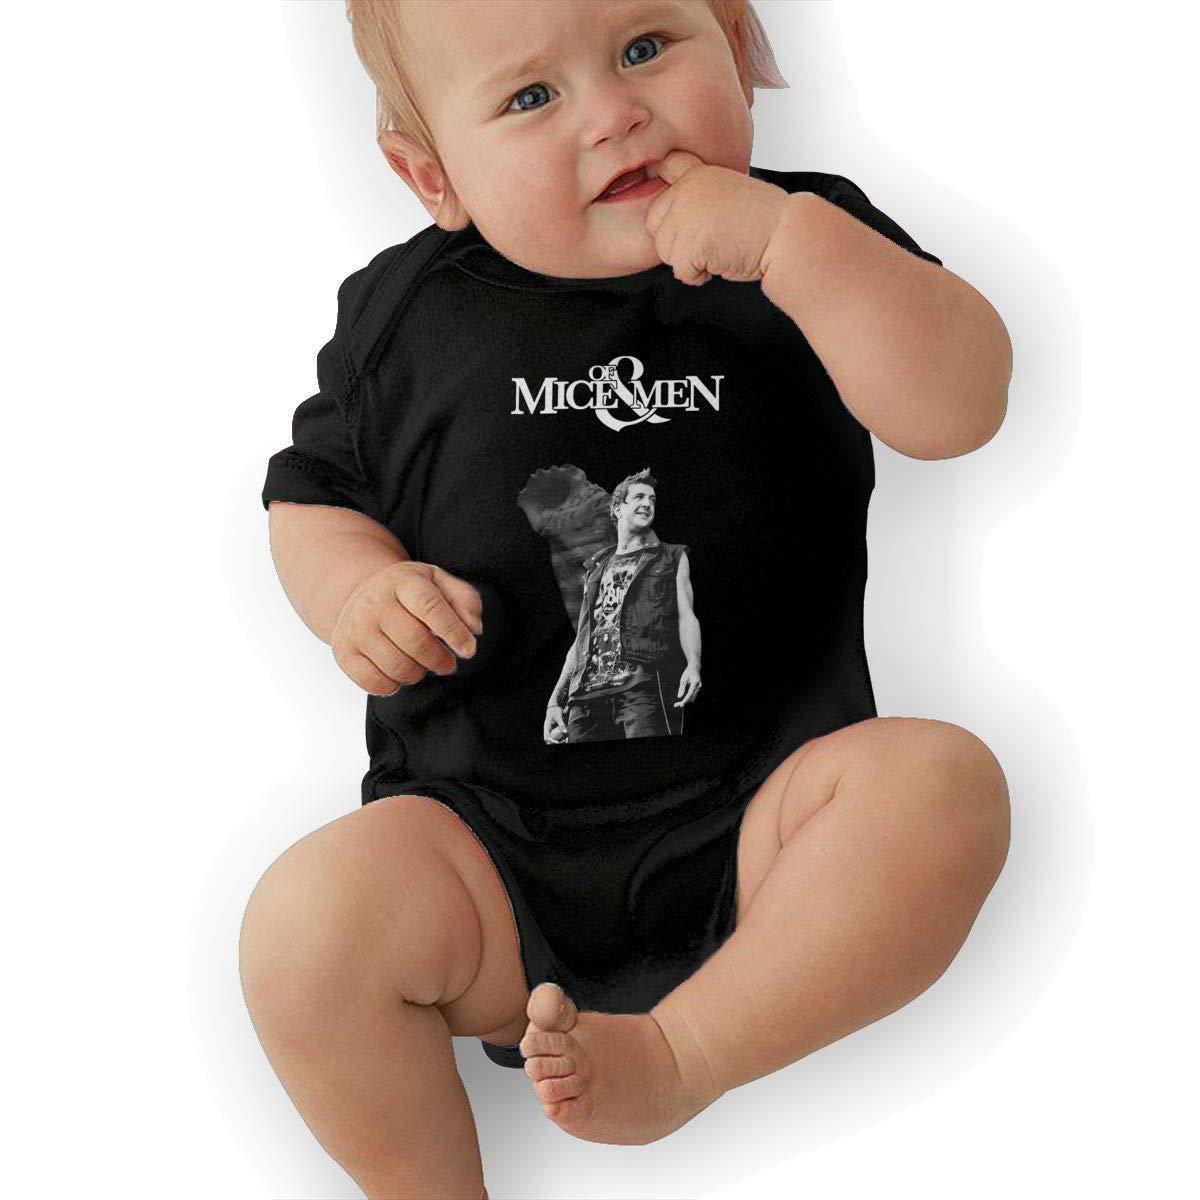 SHWPAKFA Infant of Mice /& Men Band Cute Soft Music Band Jersey Creeping Suit,Black,12M